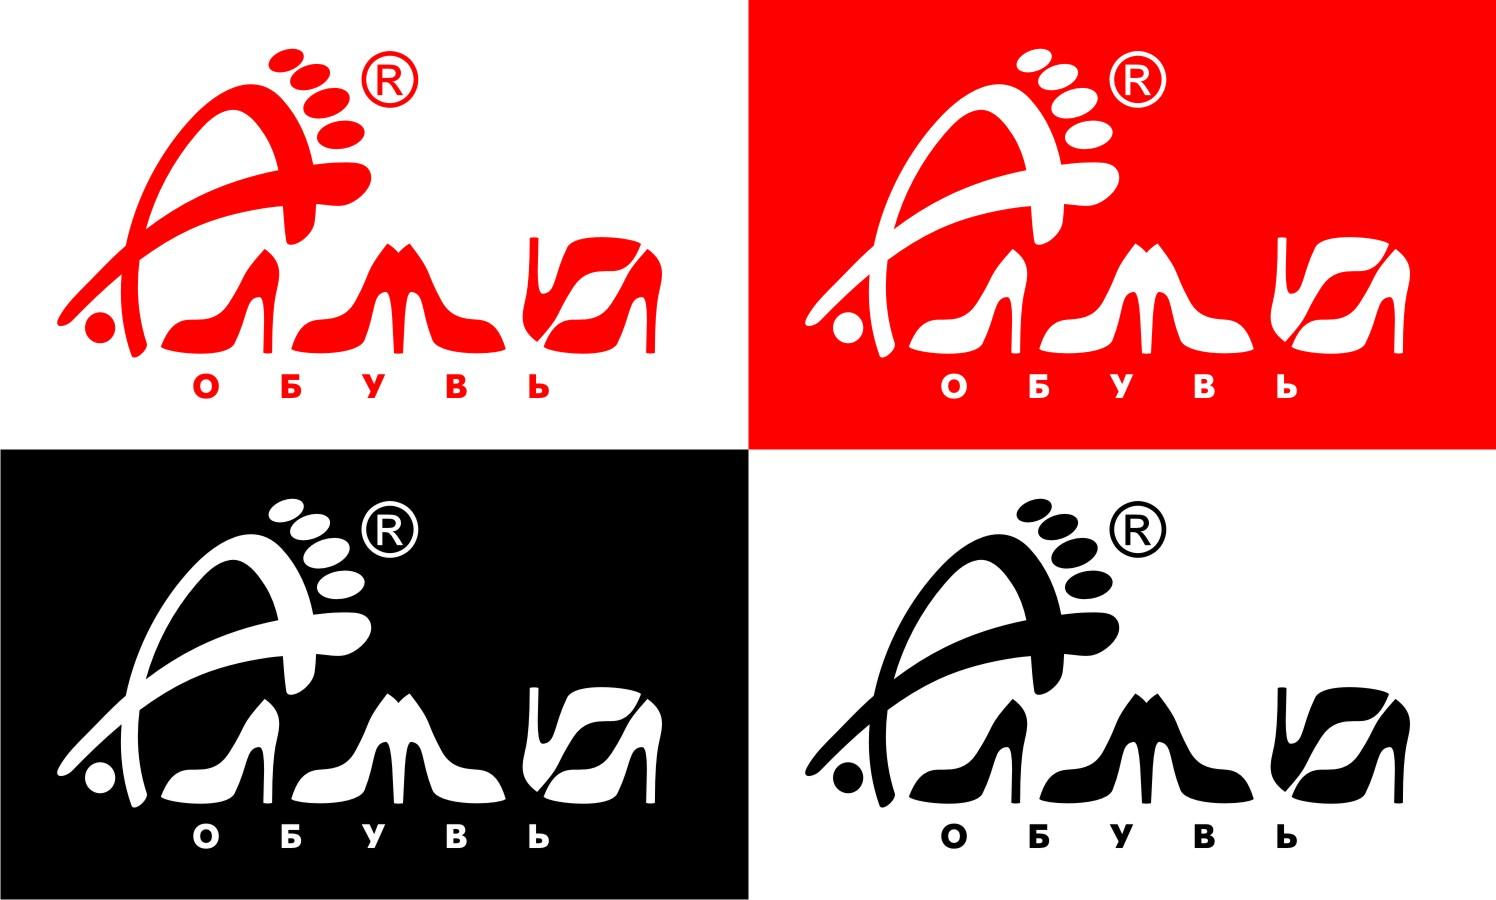 Дизайн логотипа обувной марки Алми фото f_61959efa8a7e46c9.jpg